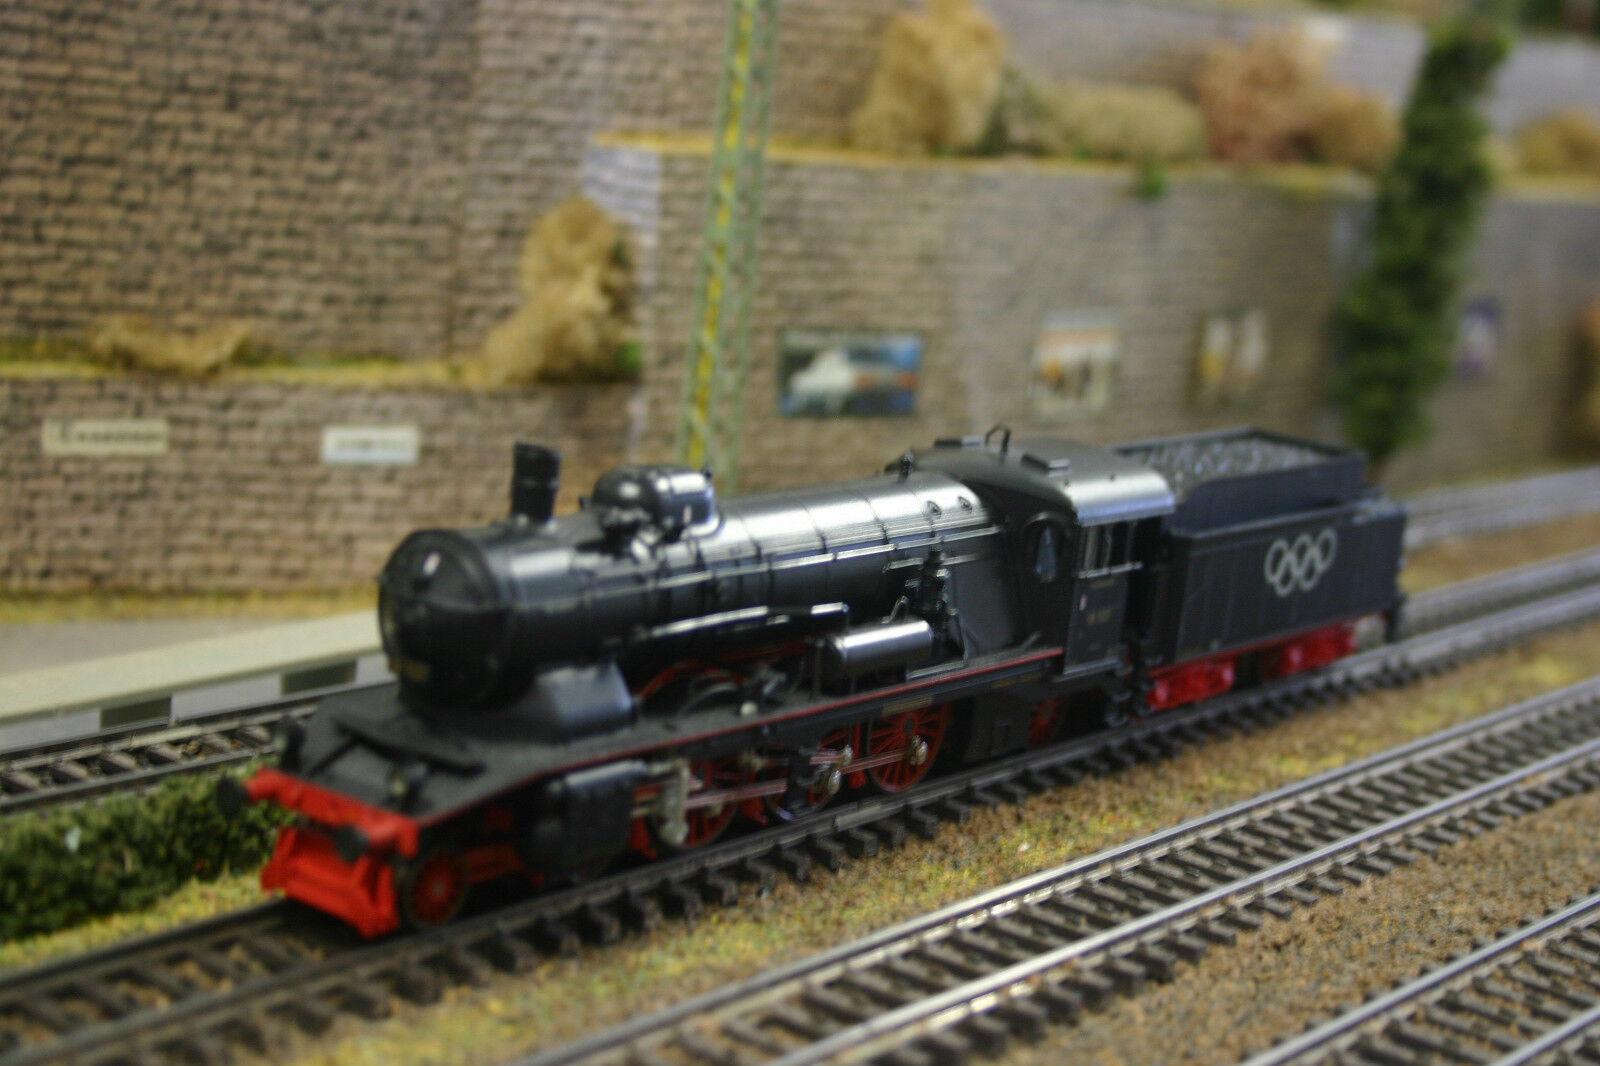 Marklin 34112 HO BR 18.1 Olympic Commemorative Steam Locomotive with Tender